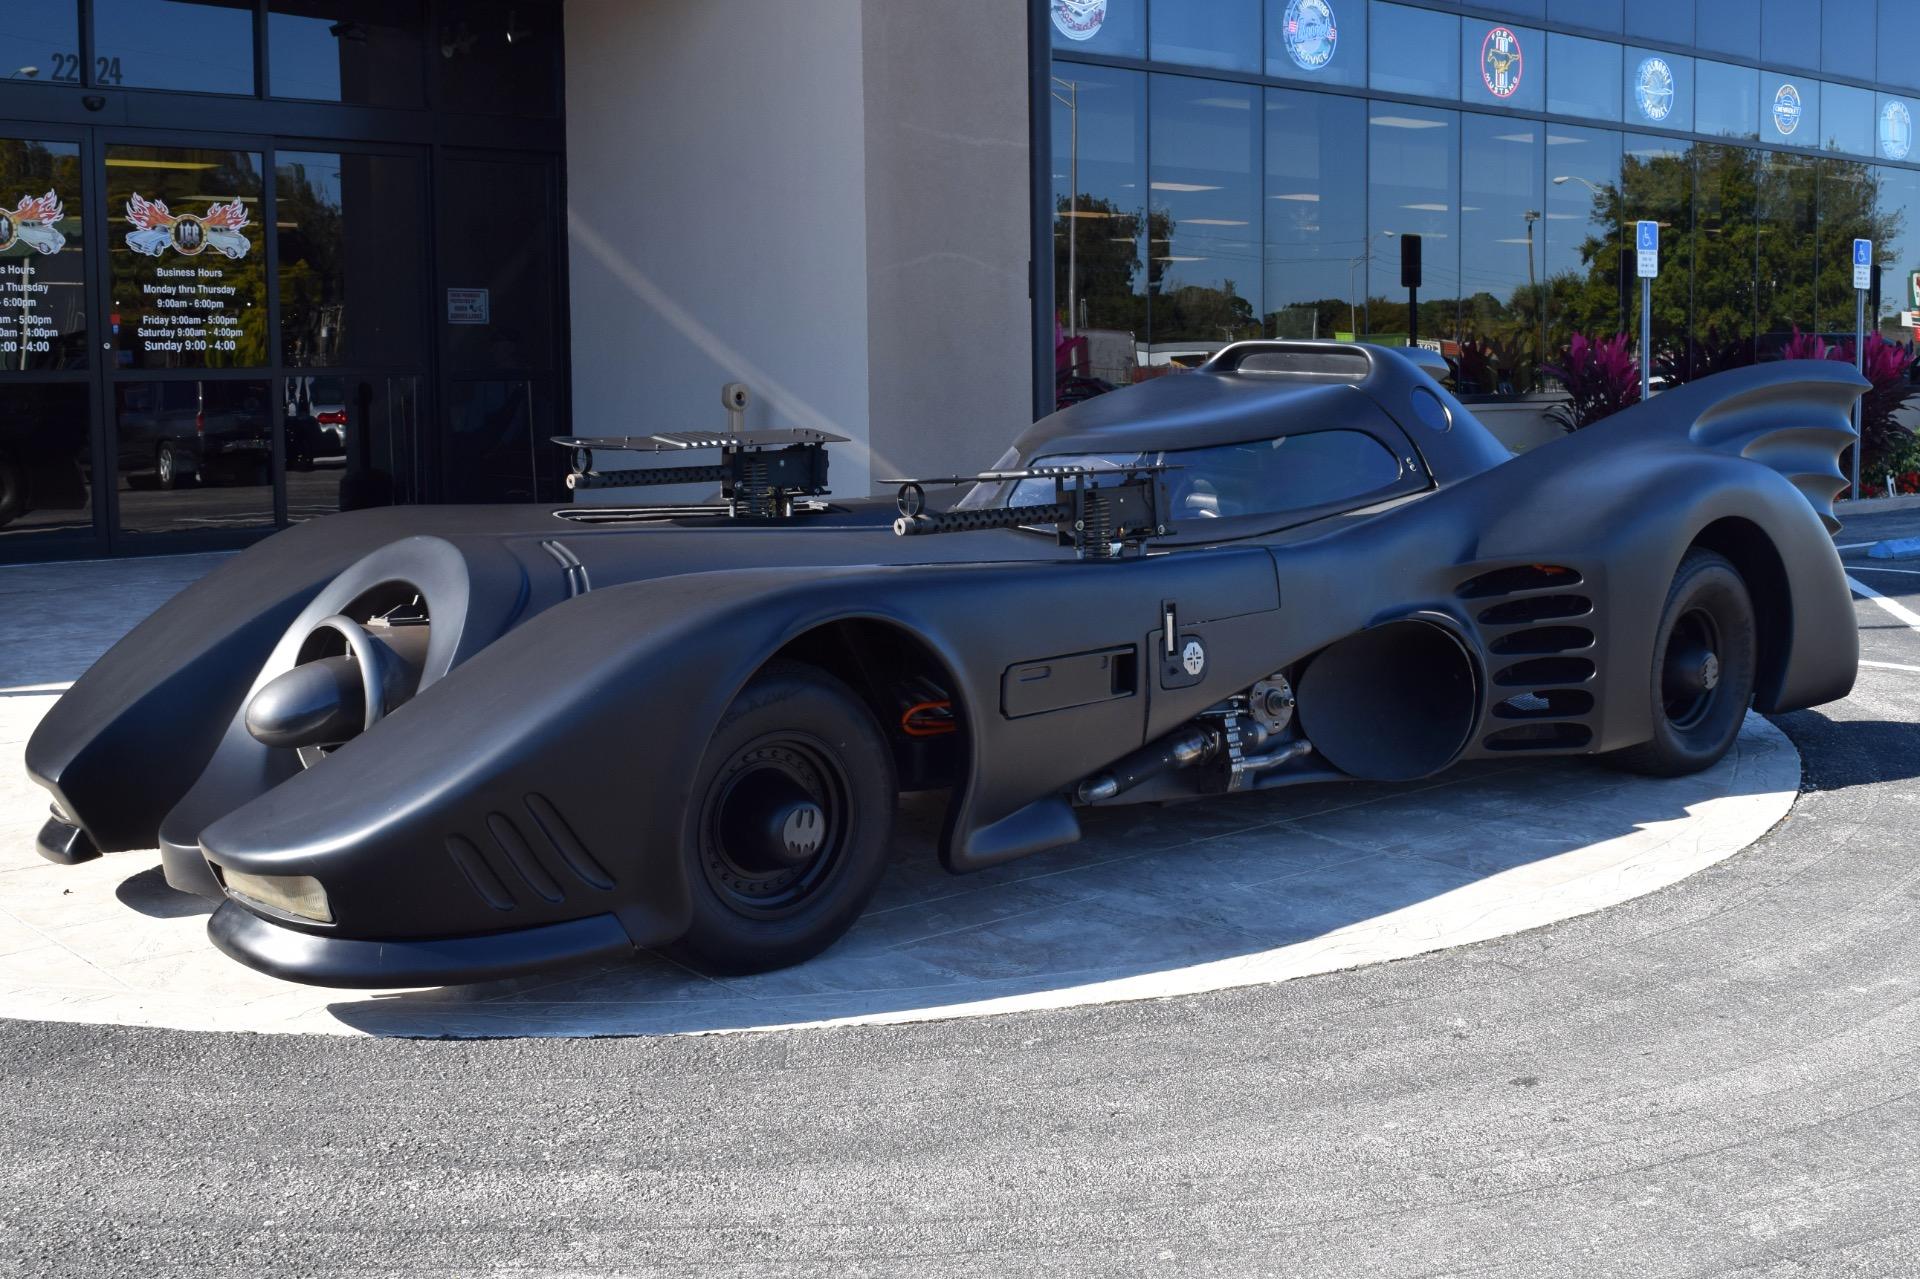 Batmobile 1989 I 1989 - 1992 Speedster #4